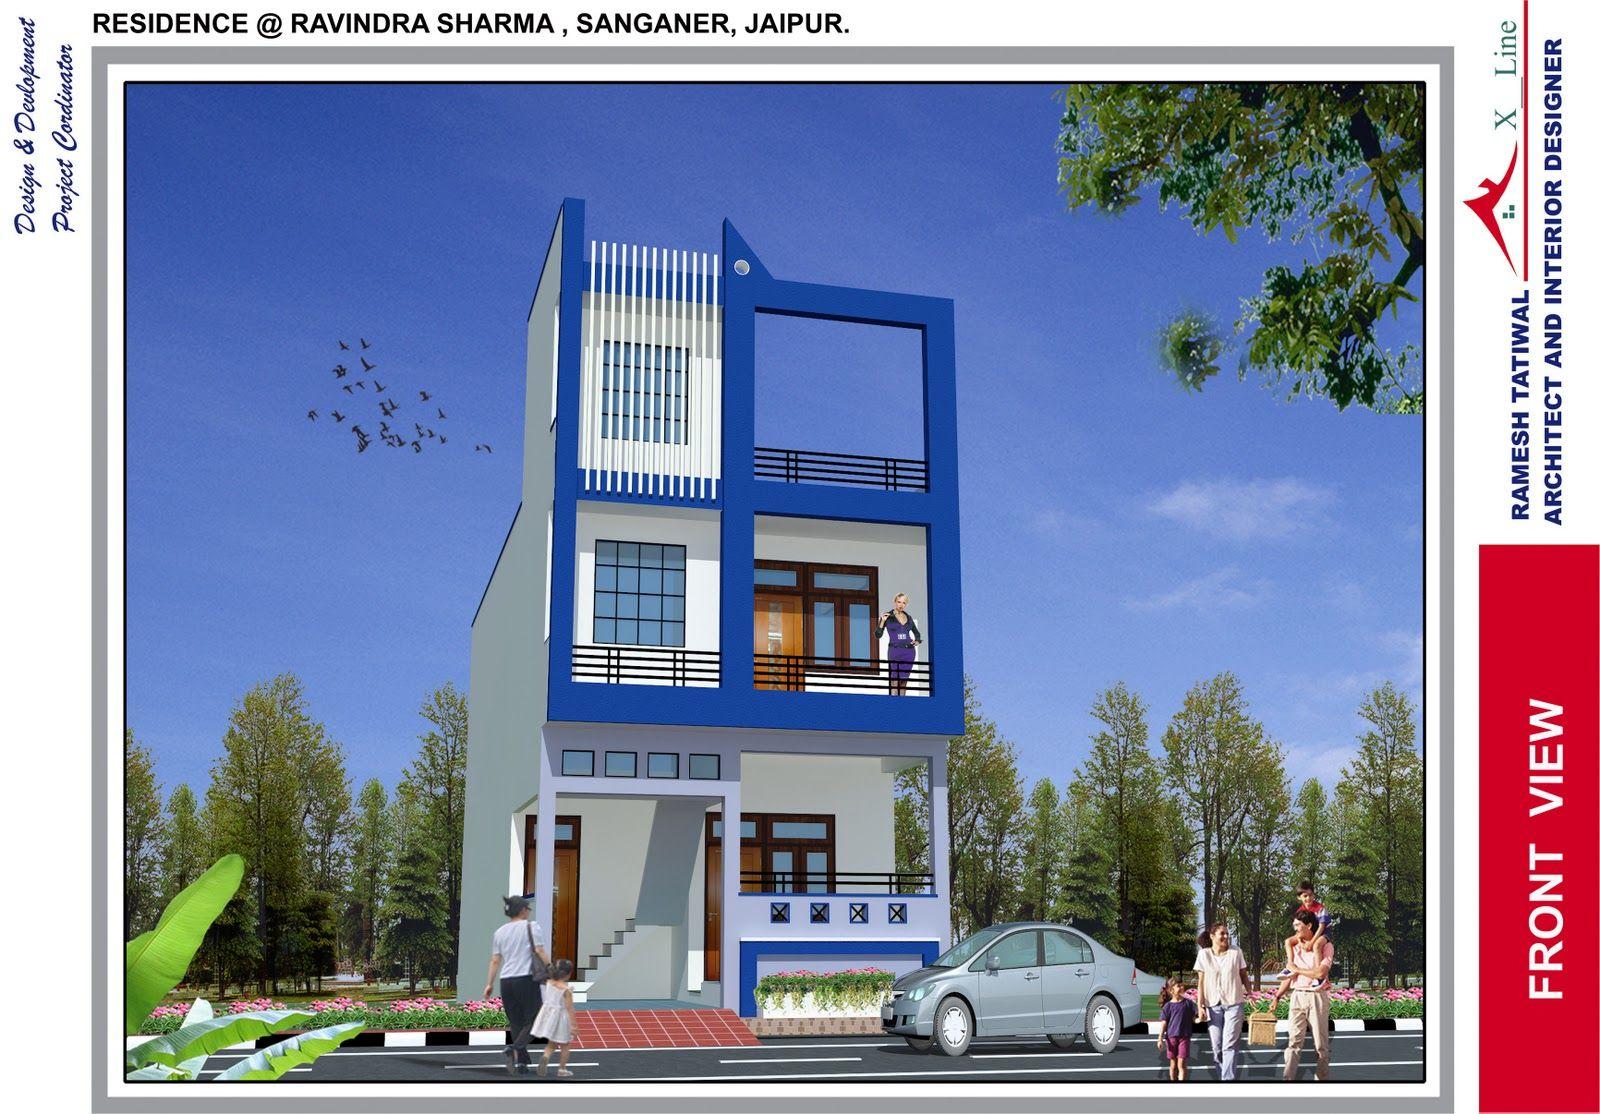 Bestes hausfrontdesign best house plans  calsclassic  pinterest  house elevation front